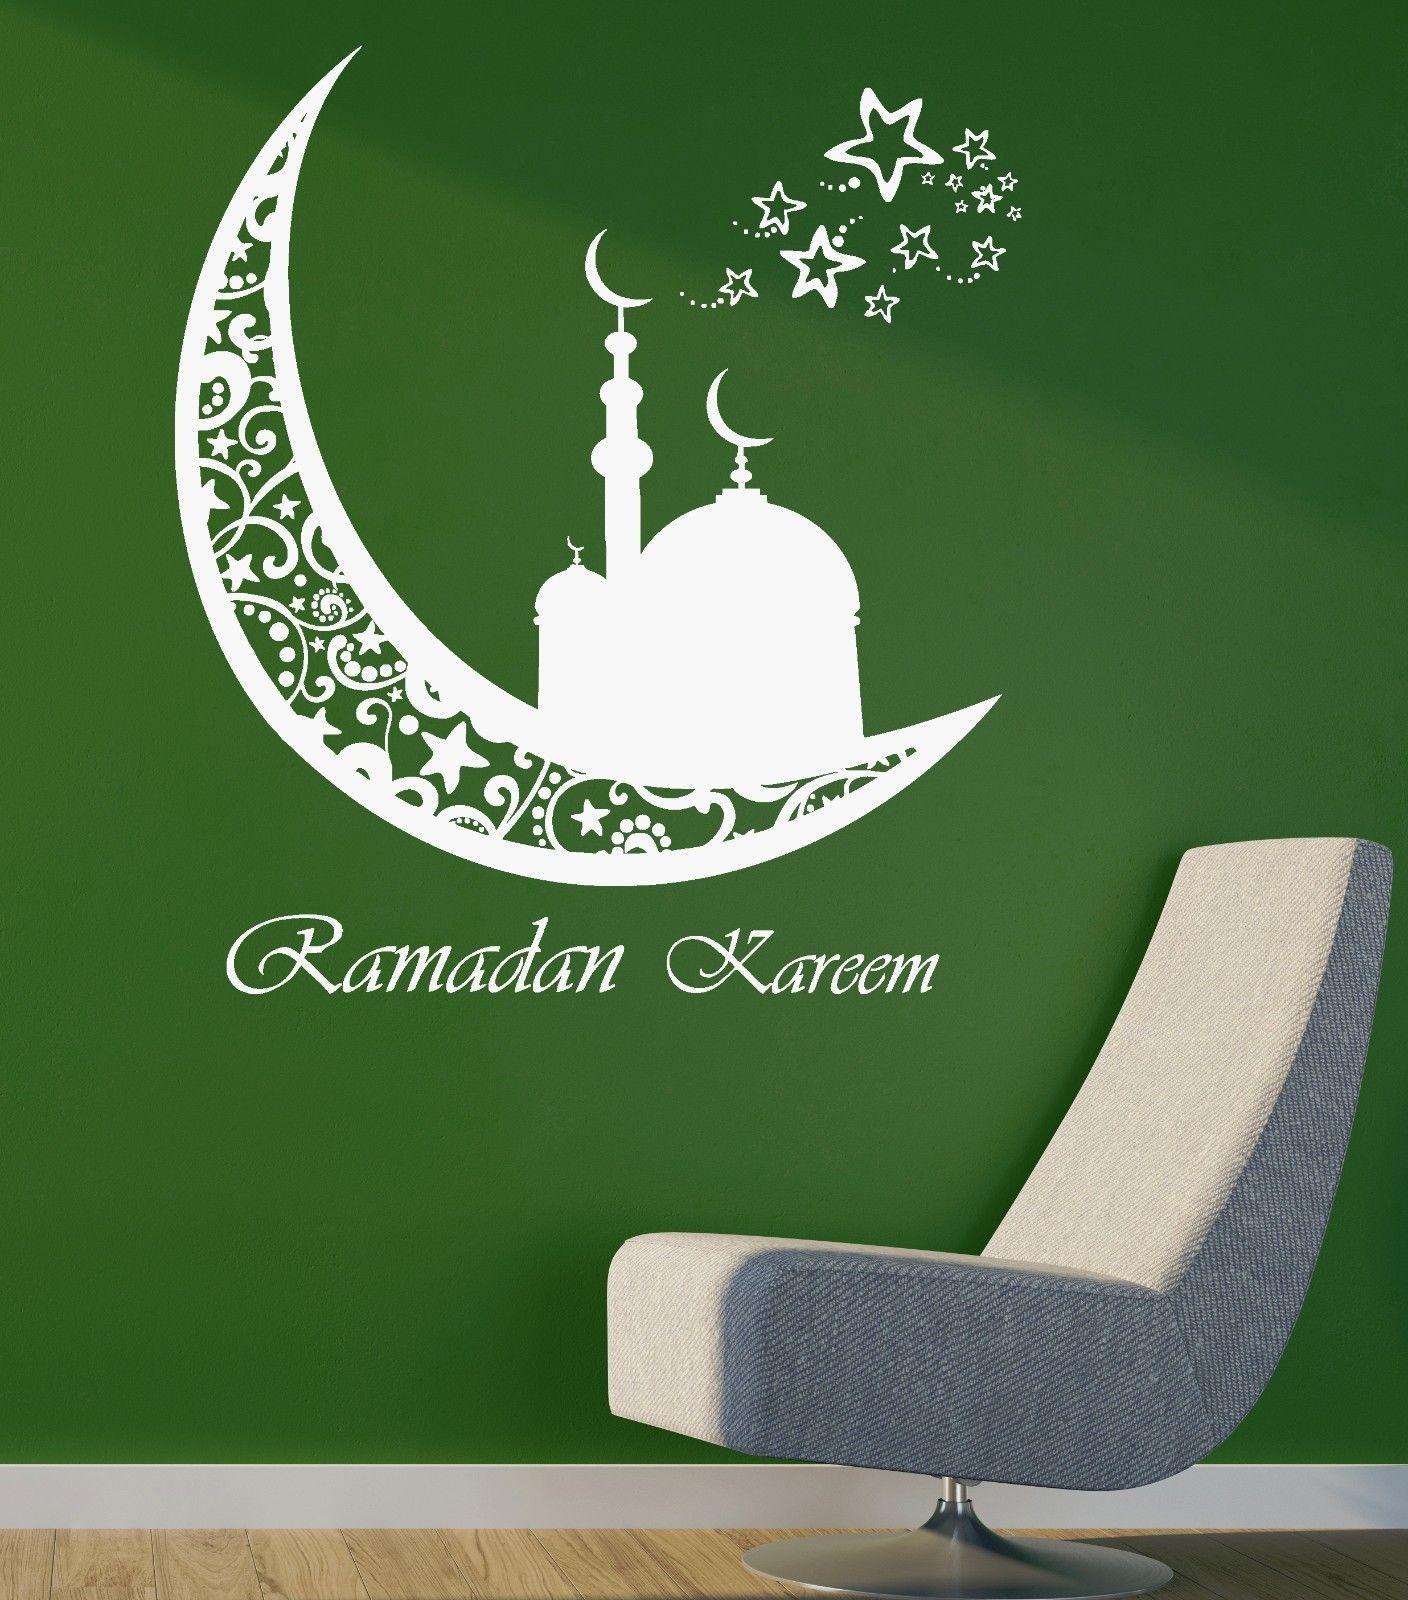 Wall Sticker Vinyl Decal Arabic Decor Ramadan Kareem Islam Muslim ig2050